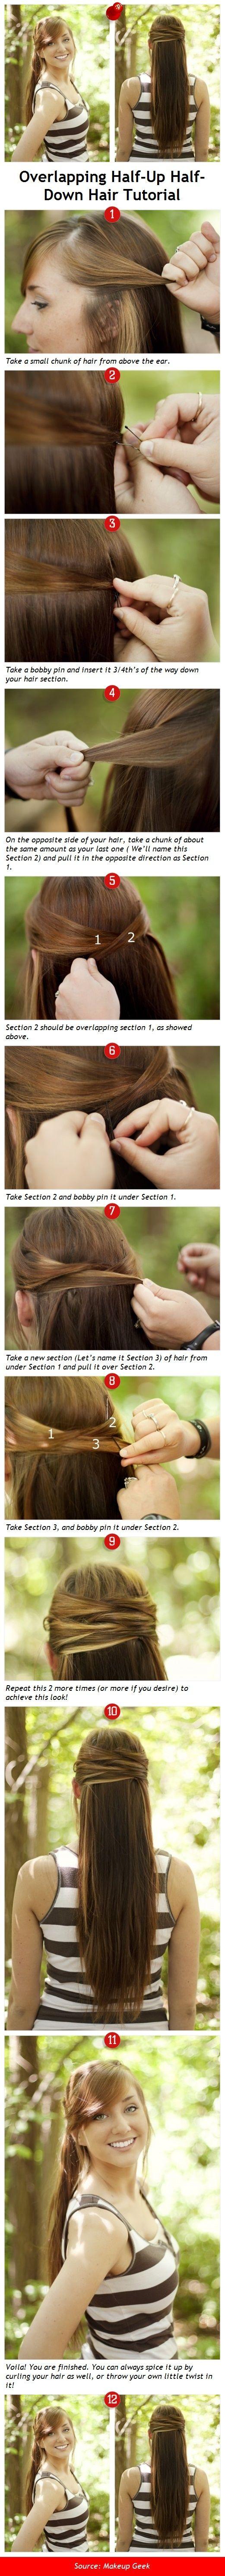 Overlapping HalfUp HalfDown Hairstylea Pinterest Hair style